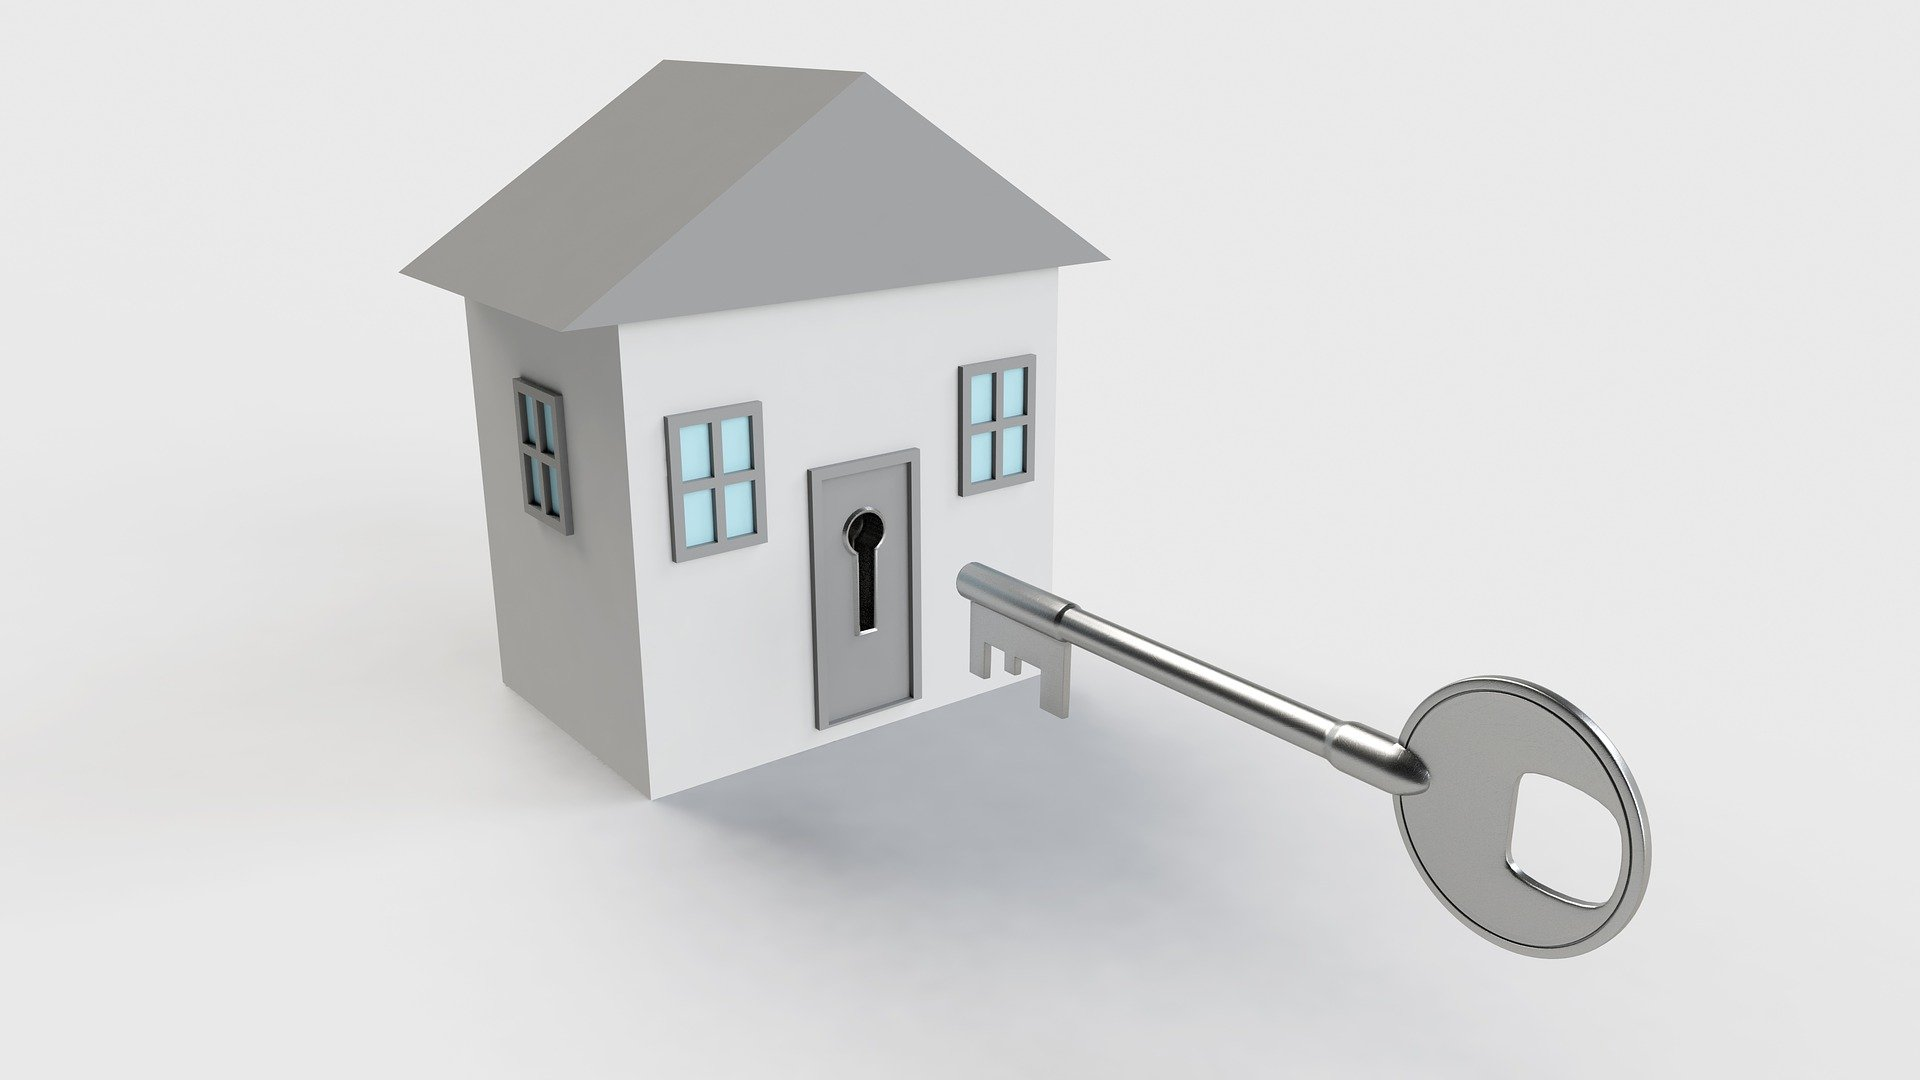 mietverwaltung-verwaltung-mieten-immobilie